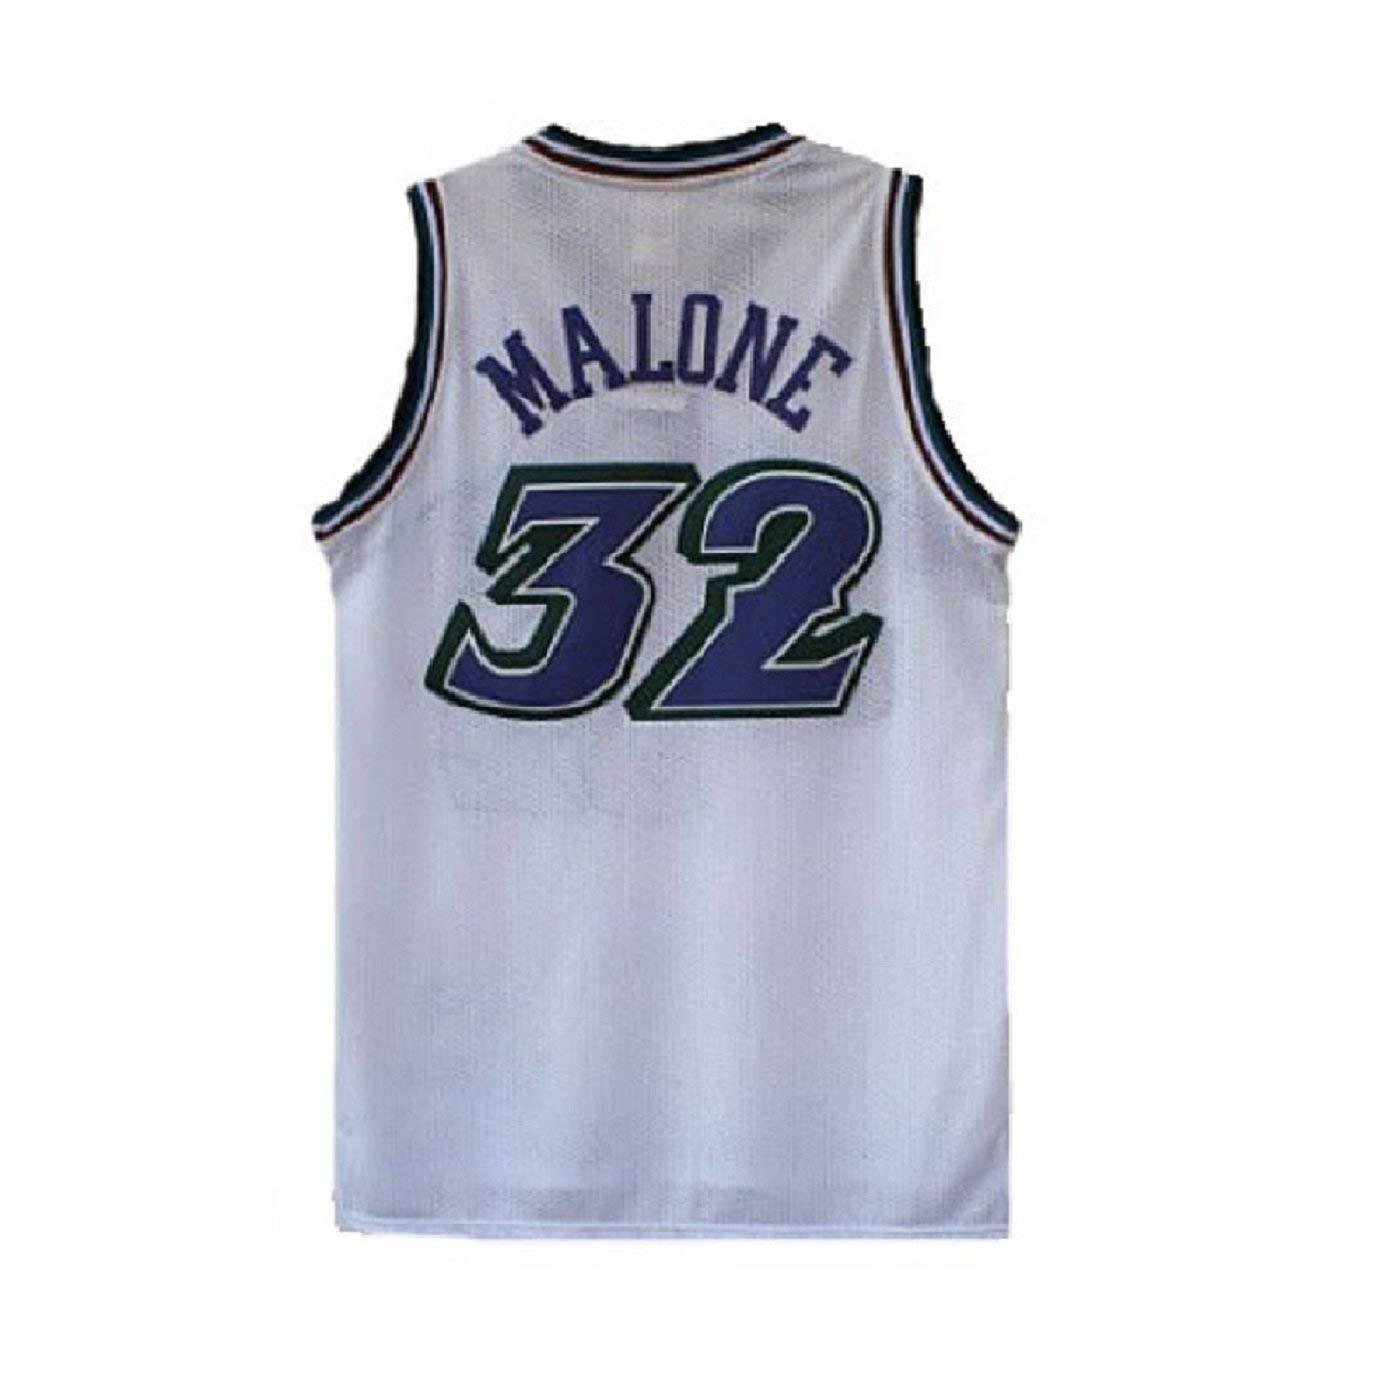 aac9cf9830b Get Quotations · maodege Men's Karl Jerseys Utah 32 Basketball Jersey  Malone Jerseys White